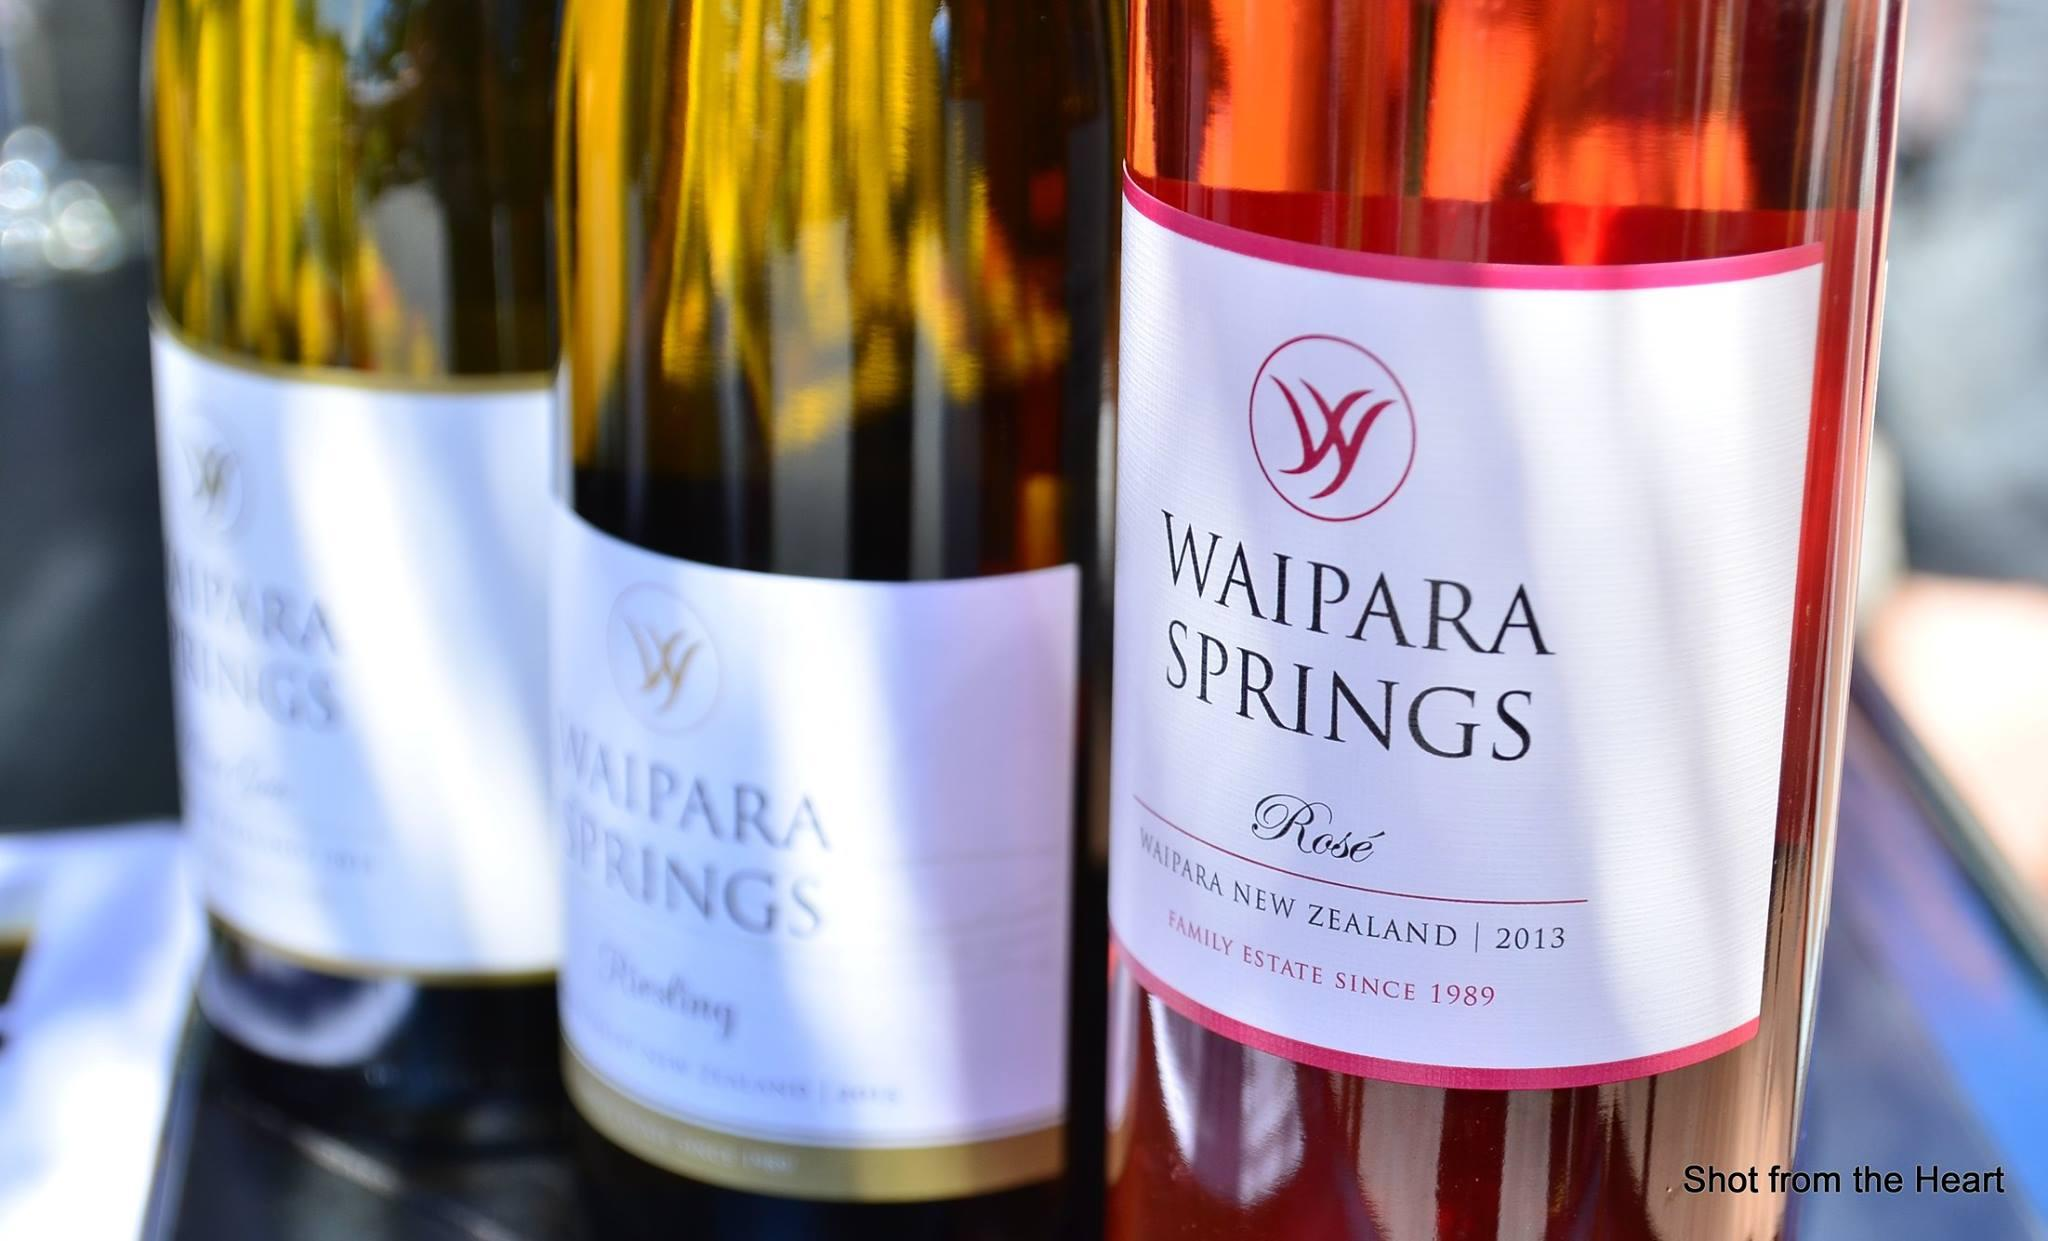 Waipara Springs Winery